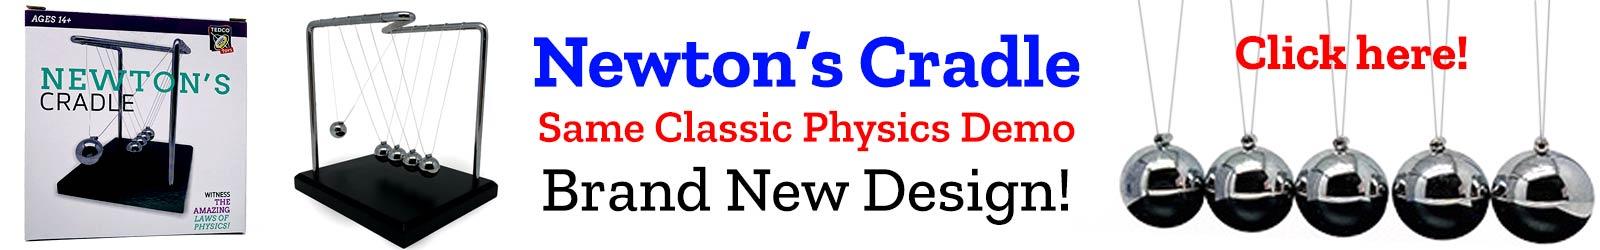 Newton's Cradle Same classic physics demo, brand new design!